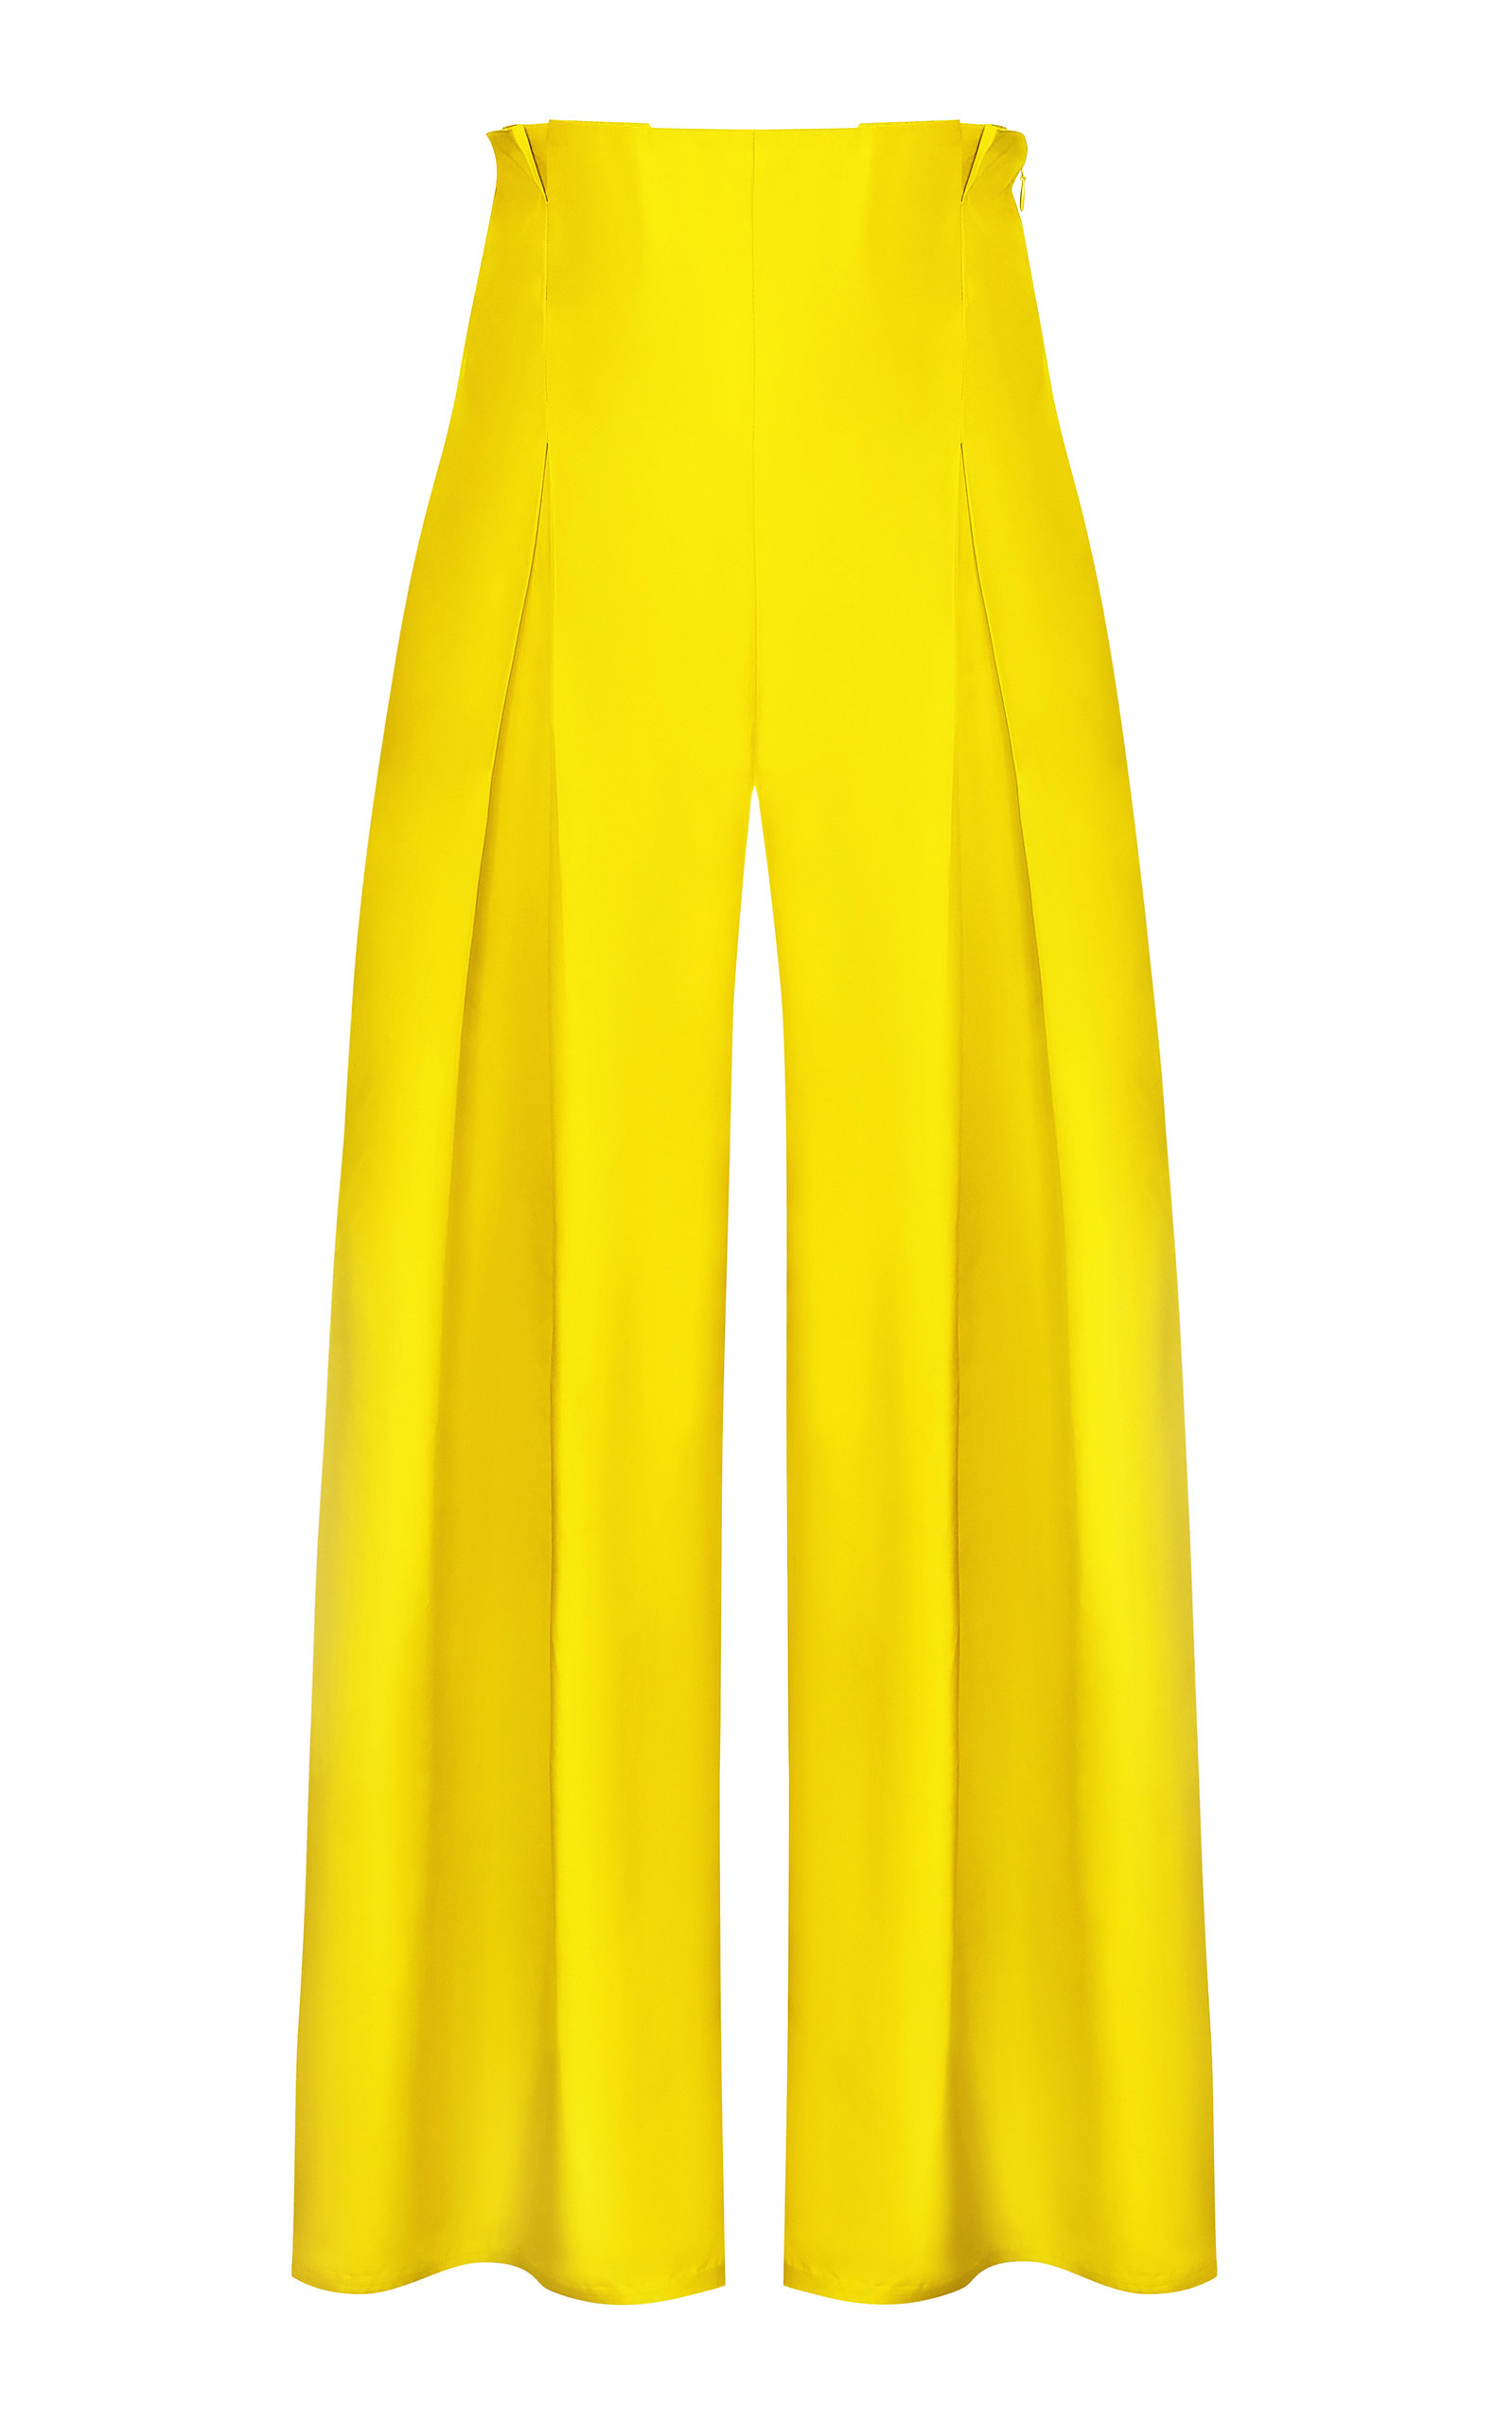 ABADIA Pleated Silk Taffeta Wide-Leg Pants in Yellow